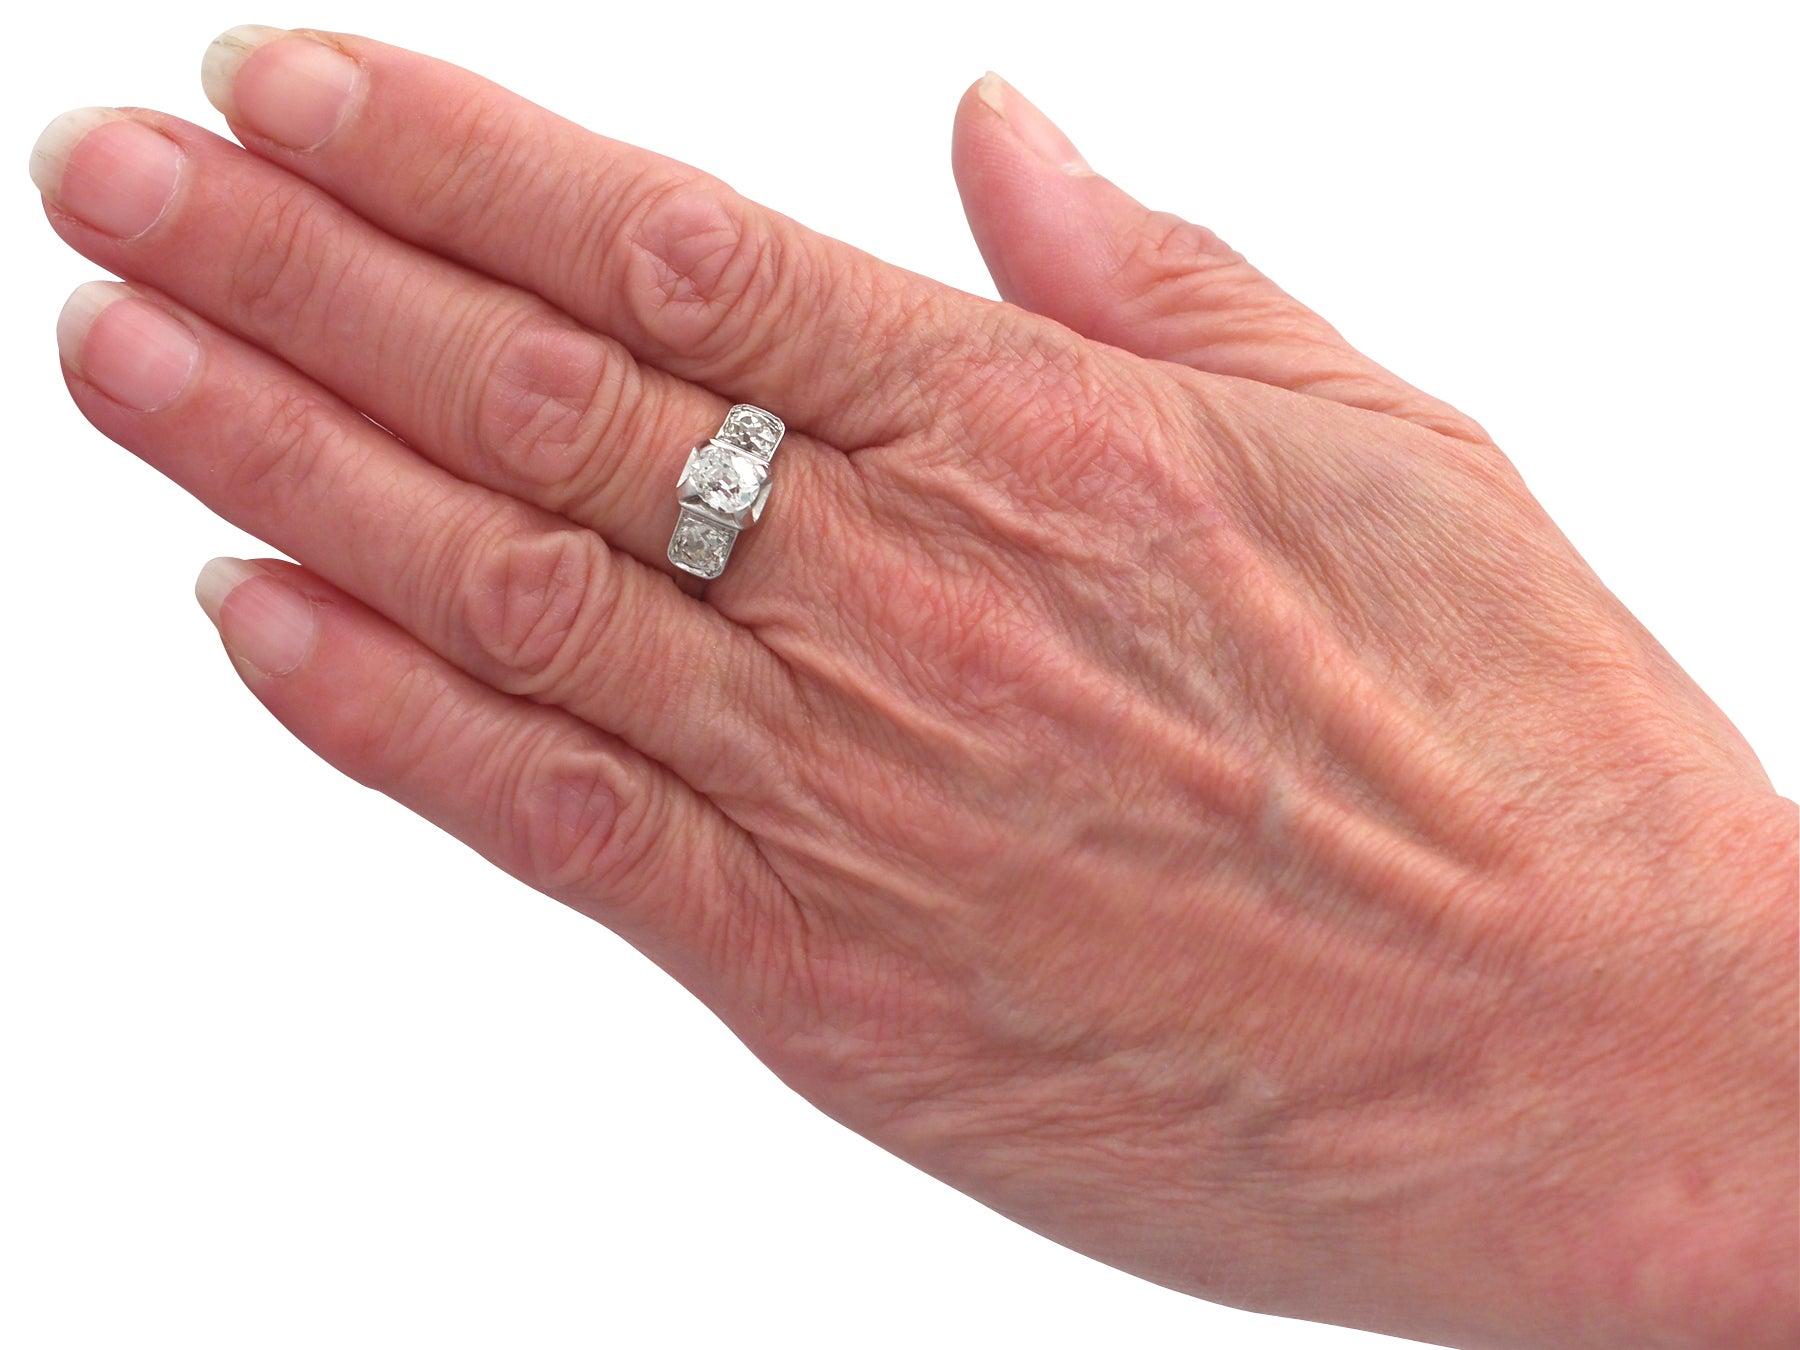 1.42Ct Diamond and Platinum Trilogy Ring - Antique French Circa 1930 ...